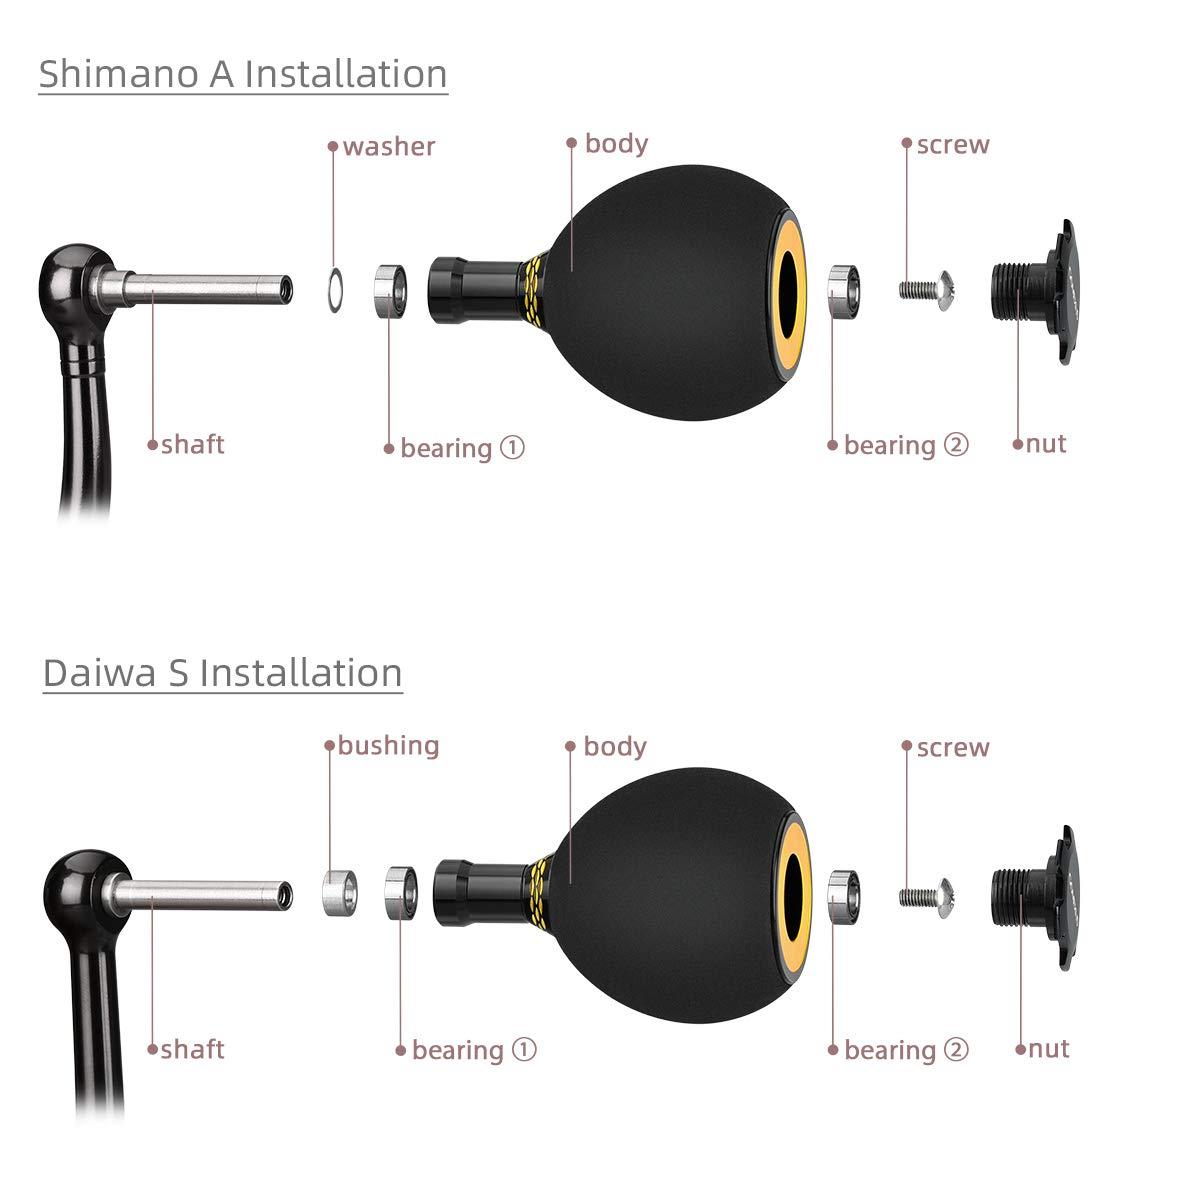 Gomexus Pomo Carrete EVA para Shimano Stradic CI4 Ultegra, Daiwa Certate Luvias Perilla Carretes de Pesca Spinning Directo, Daiwa BG Ninja Perforación ...